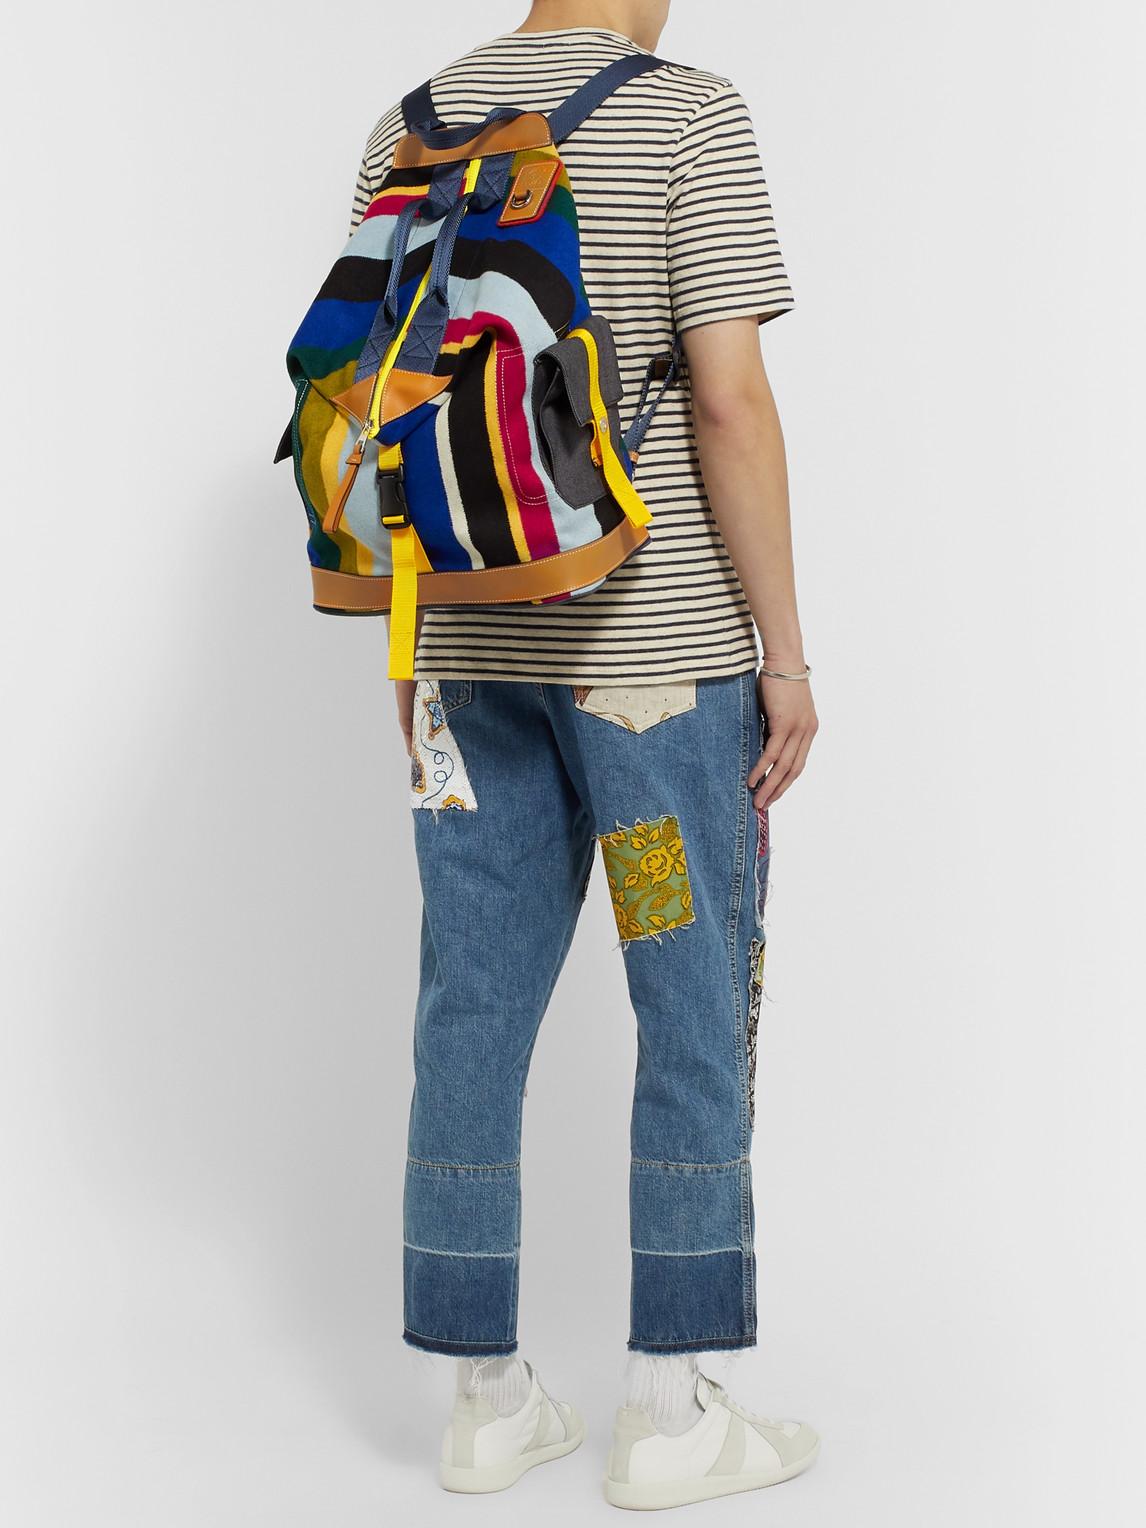 Loewe Backpacks EYE/LOEWE/NATURE LEATHER-TRIMMED STRIPED FLEECE AND CANVAS BACKPACK